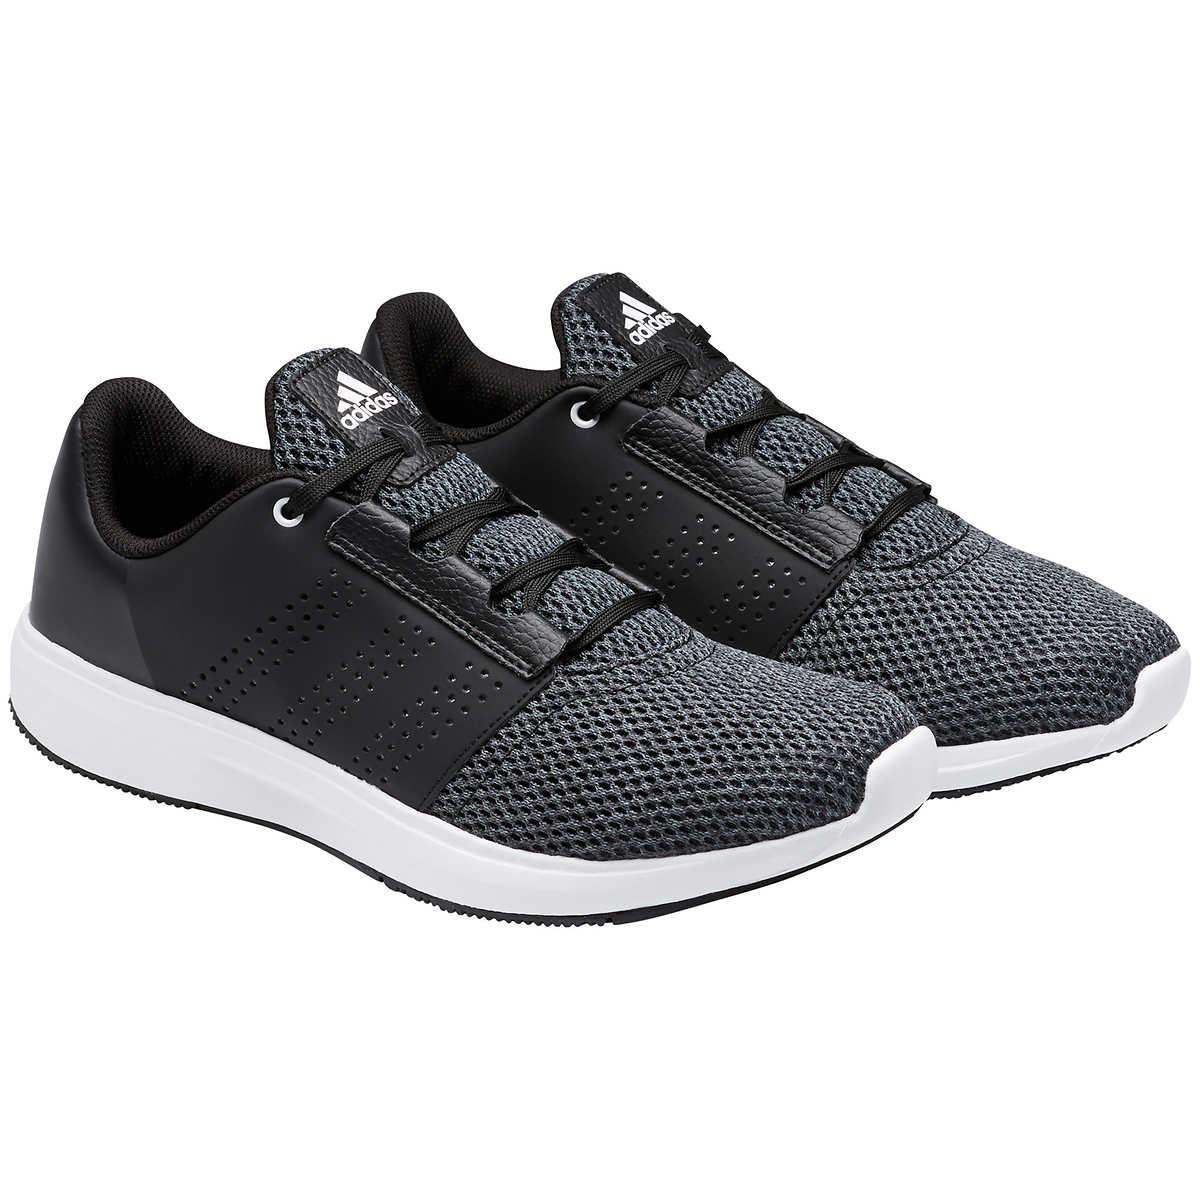 imageservice profileid id recipeid  adidas men s madoru 2 knit athletic shoe